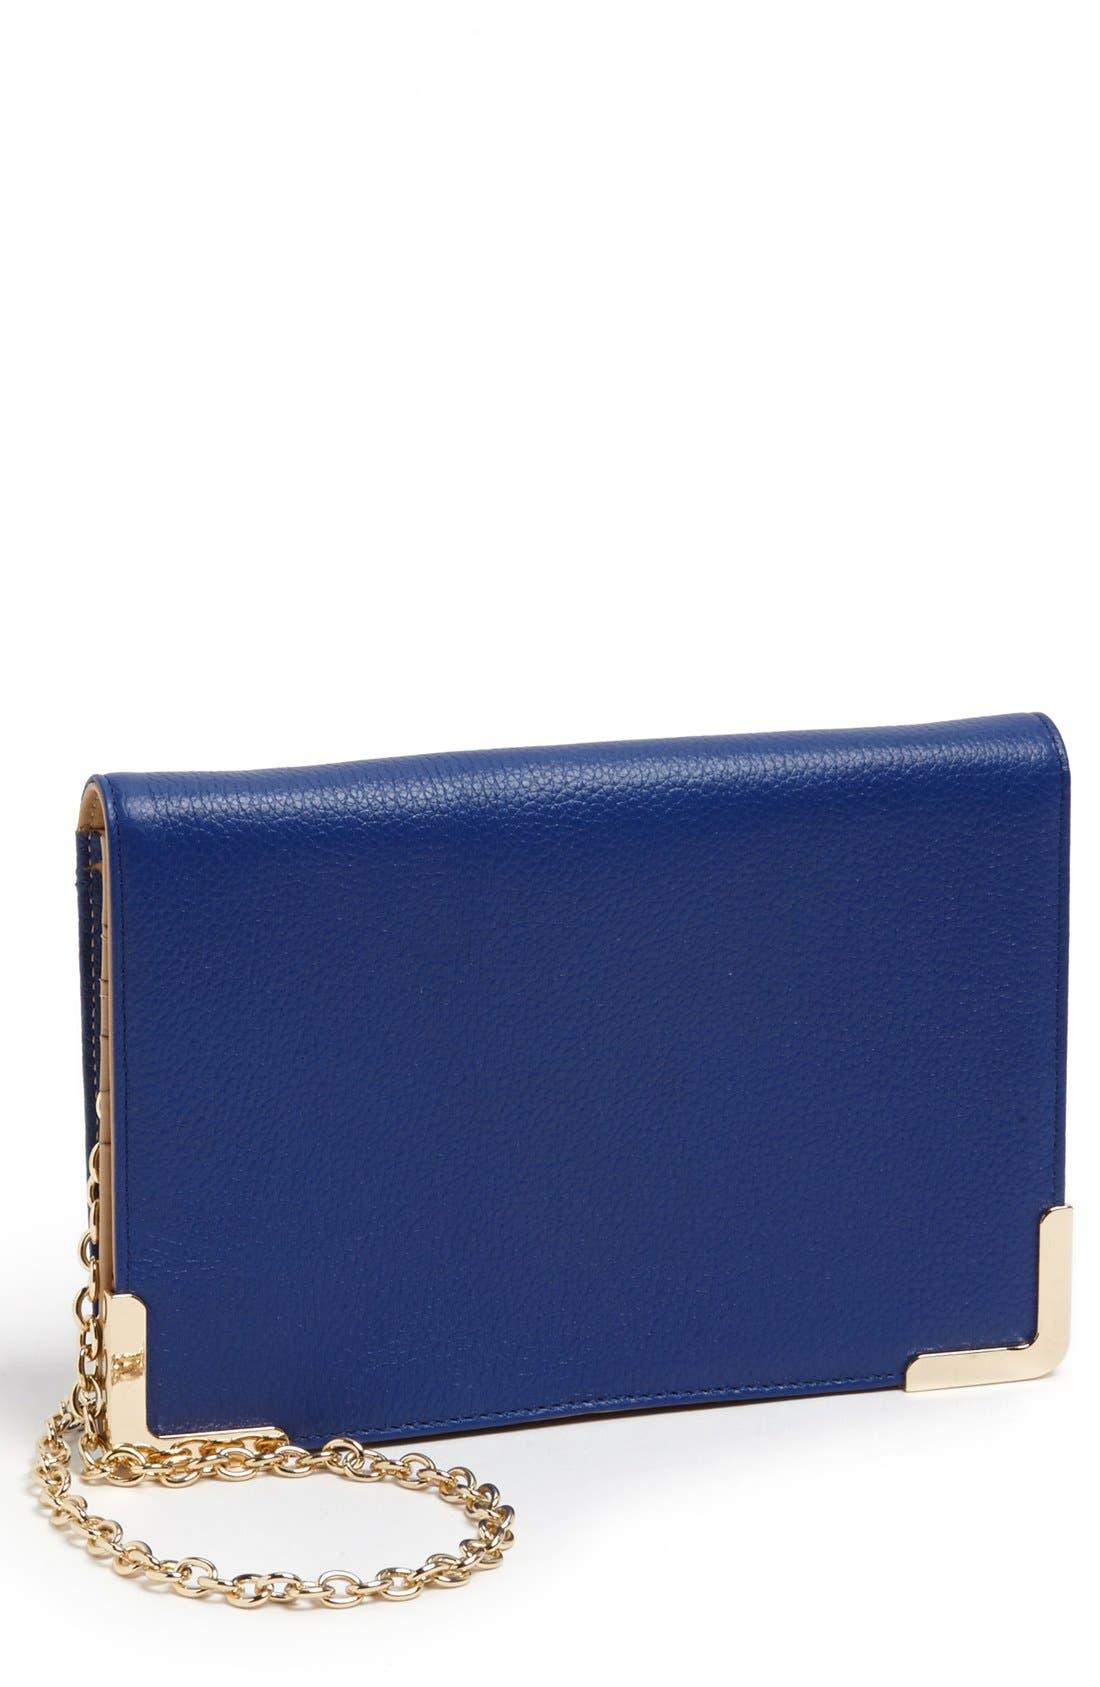 Main Image - Trouvé Leather Crossbody Bag